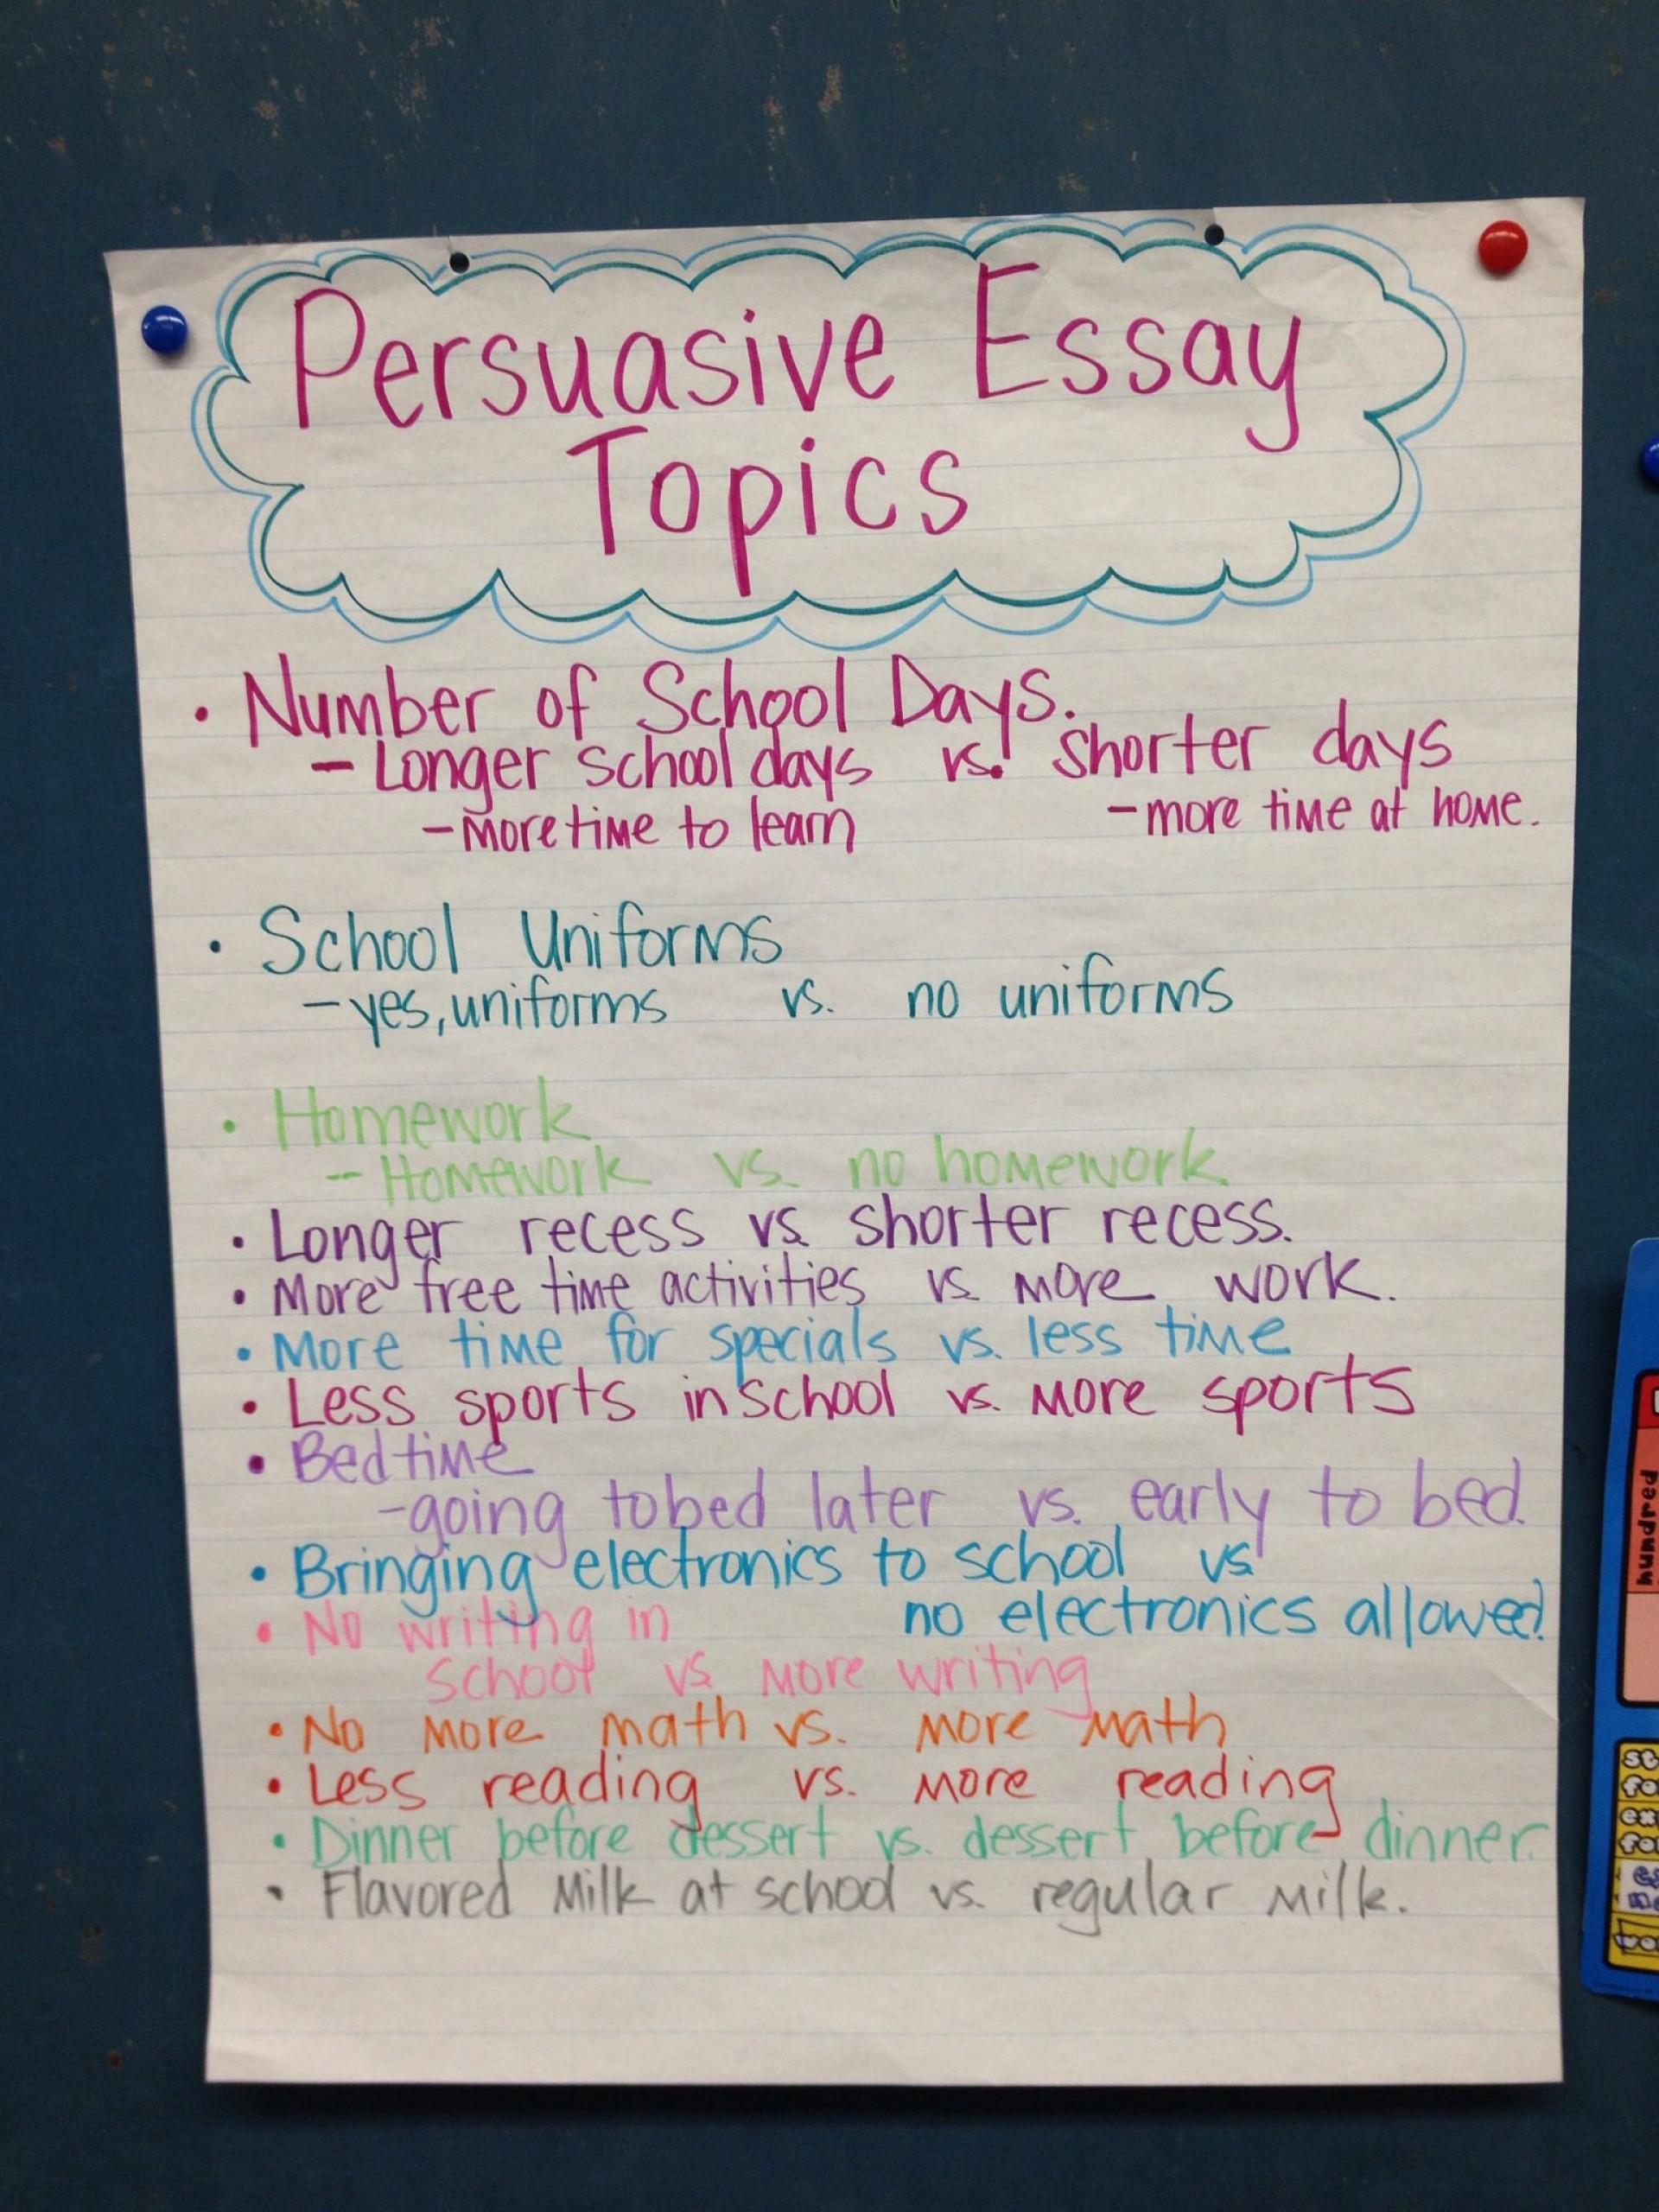 013 Good Persuasive Essay Topics Example Amazing For College Argumentative High School 1920